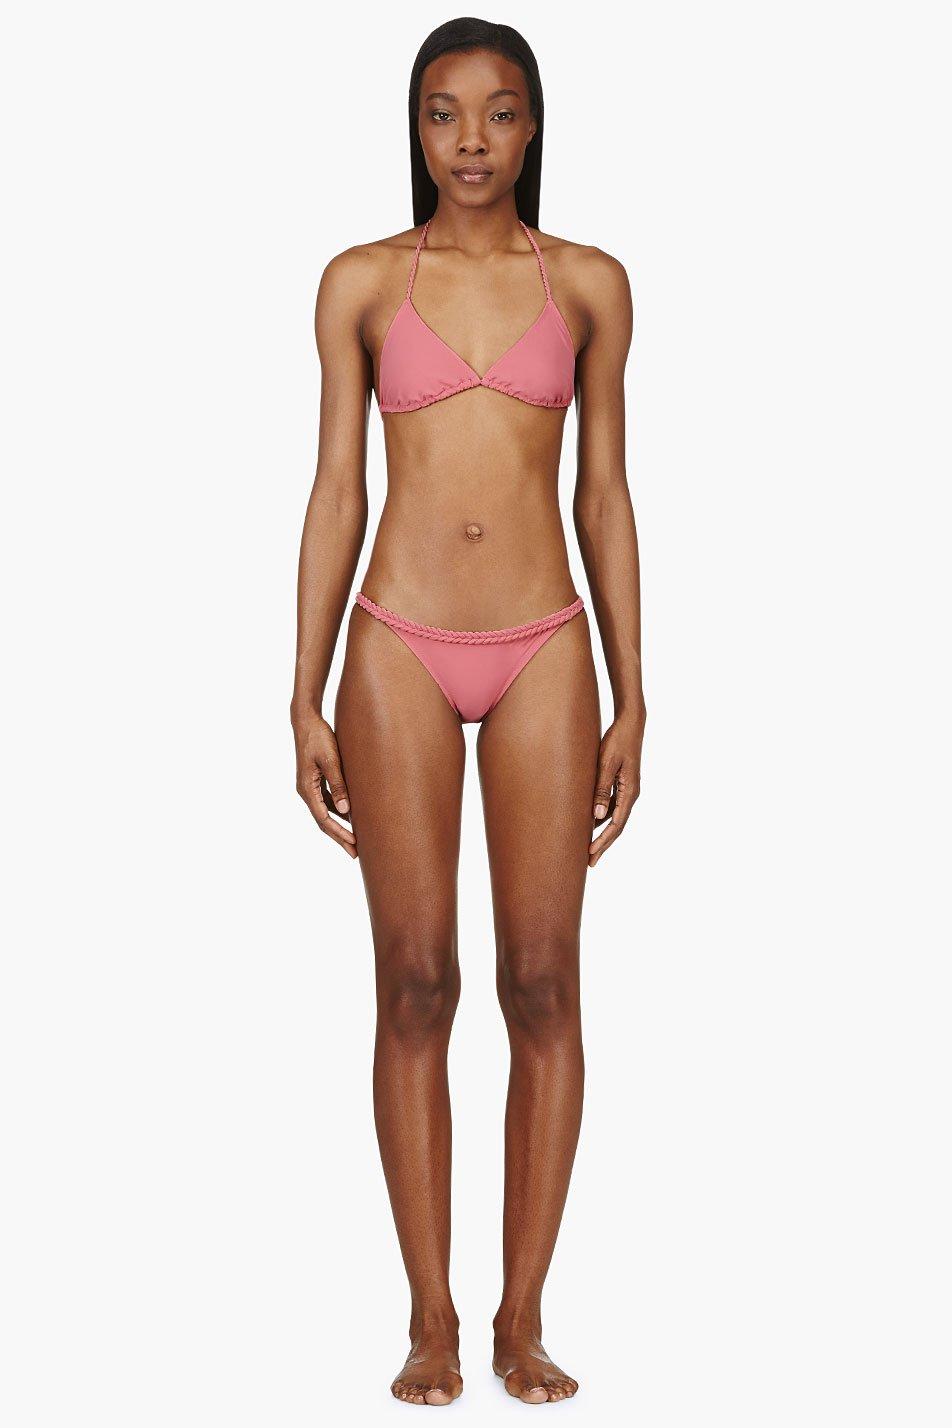 Chlo Rose Pink Braided Strap Triangle Bikini